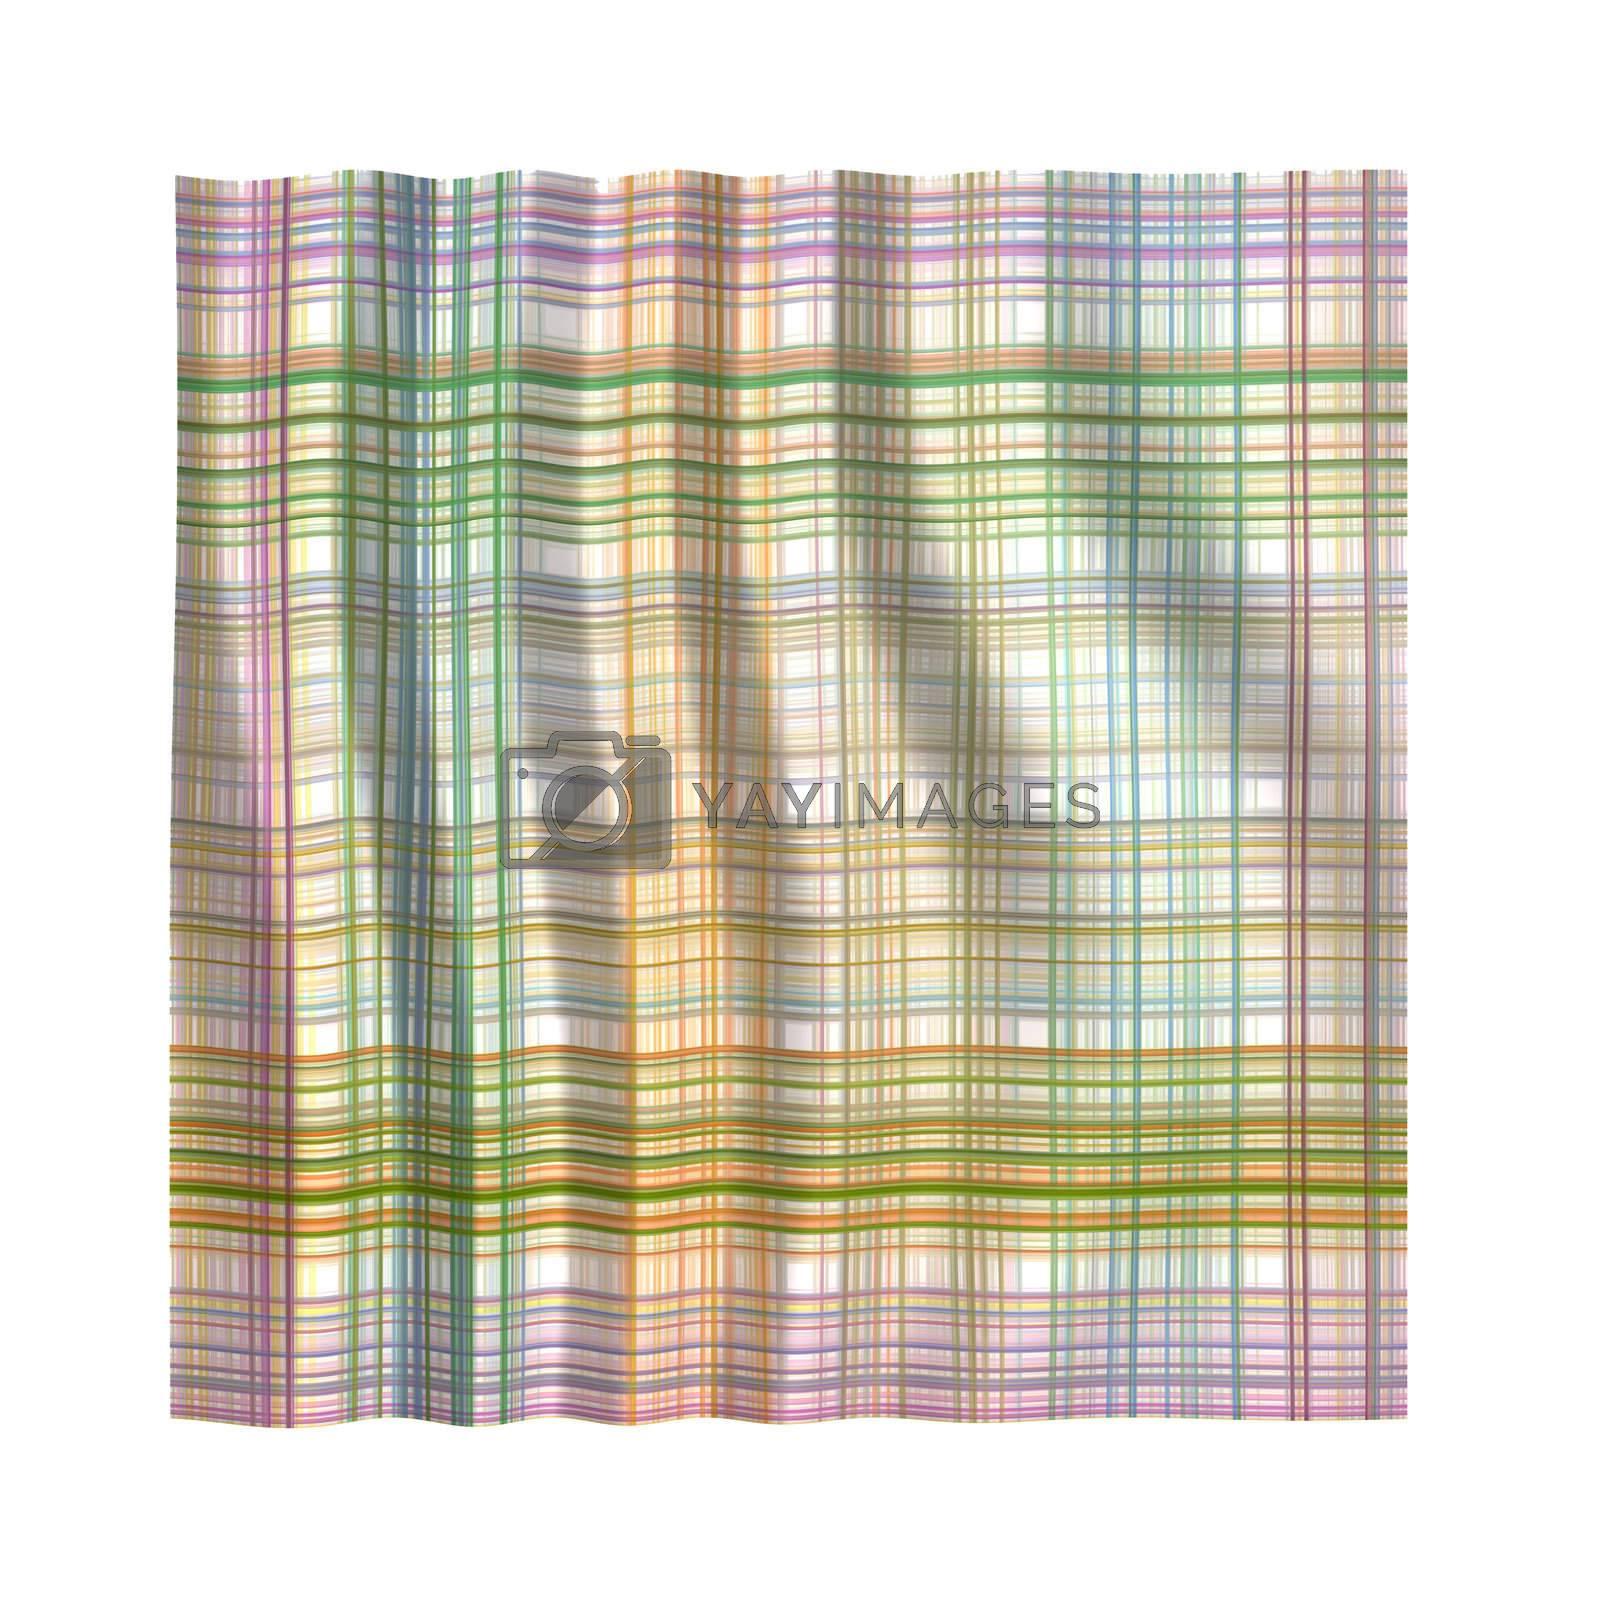 clean wrinkled tartan handkerchief in pastel colors on white background